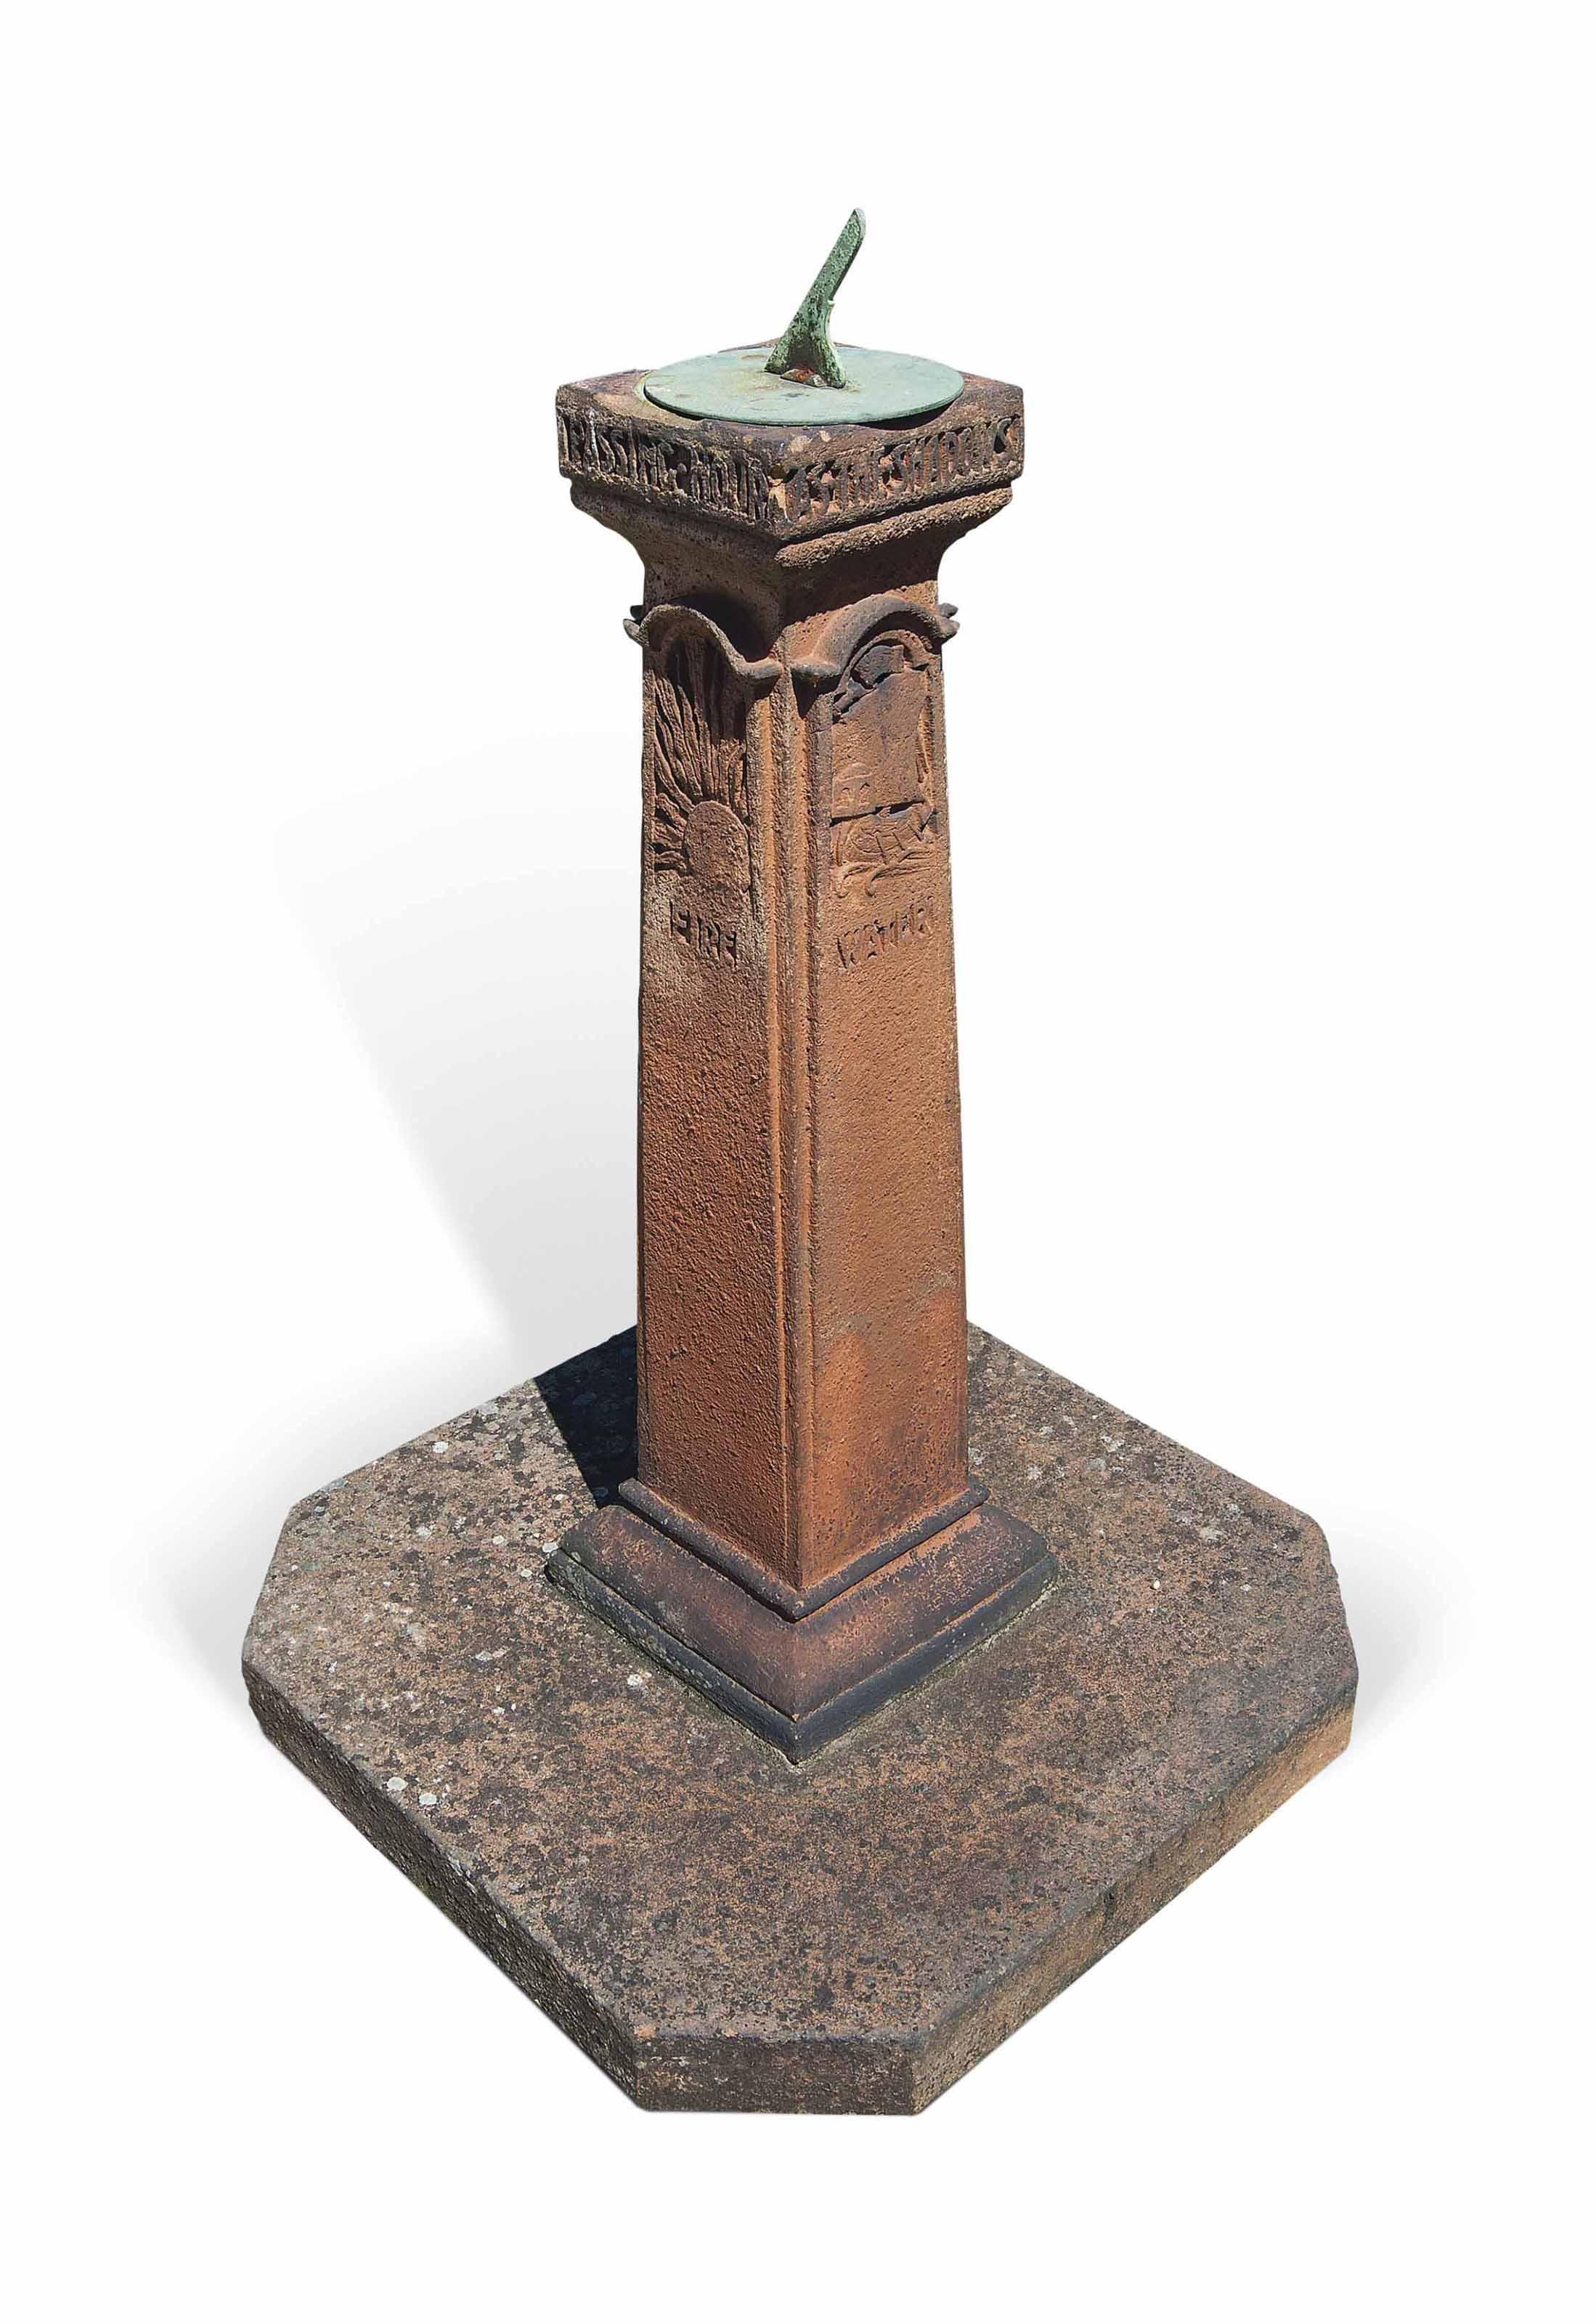 large stone photos antiques antique atlas weathered ston pedestal concrete sundial patinated